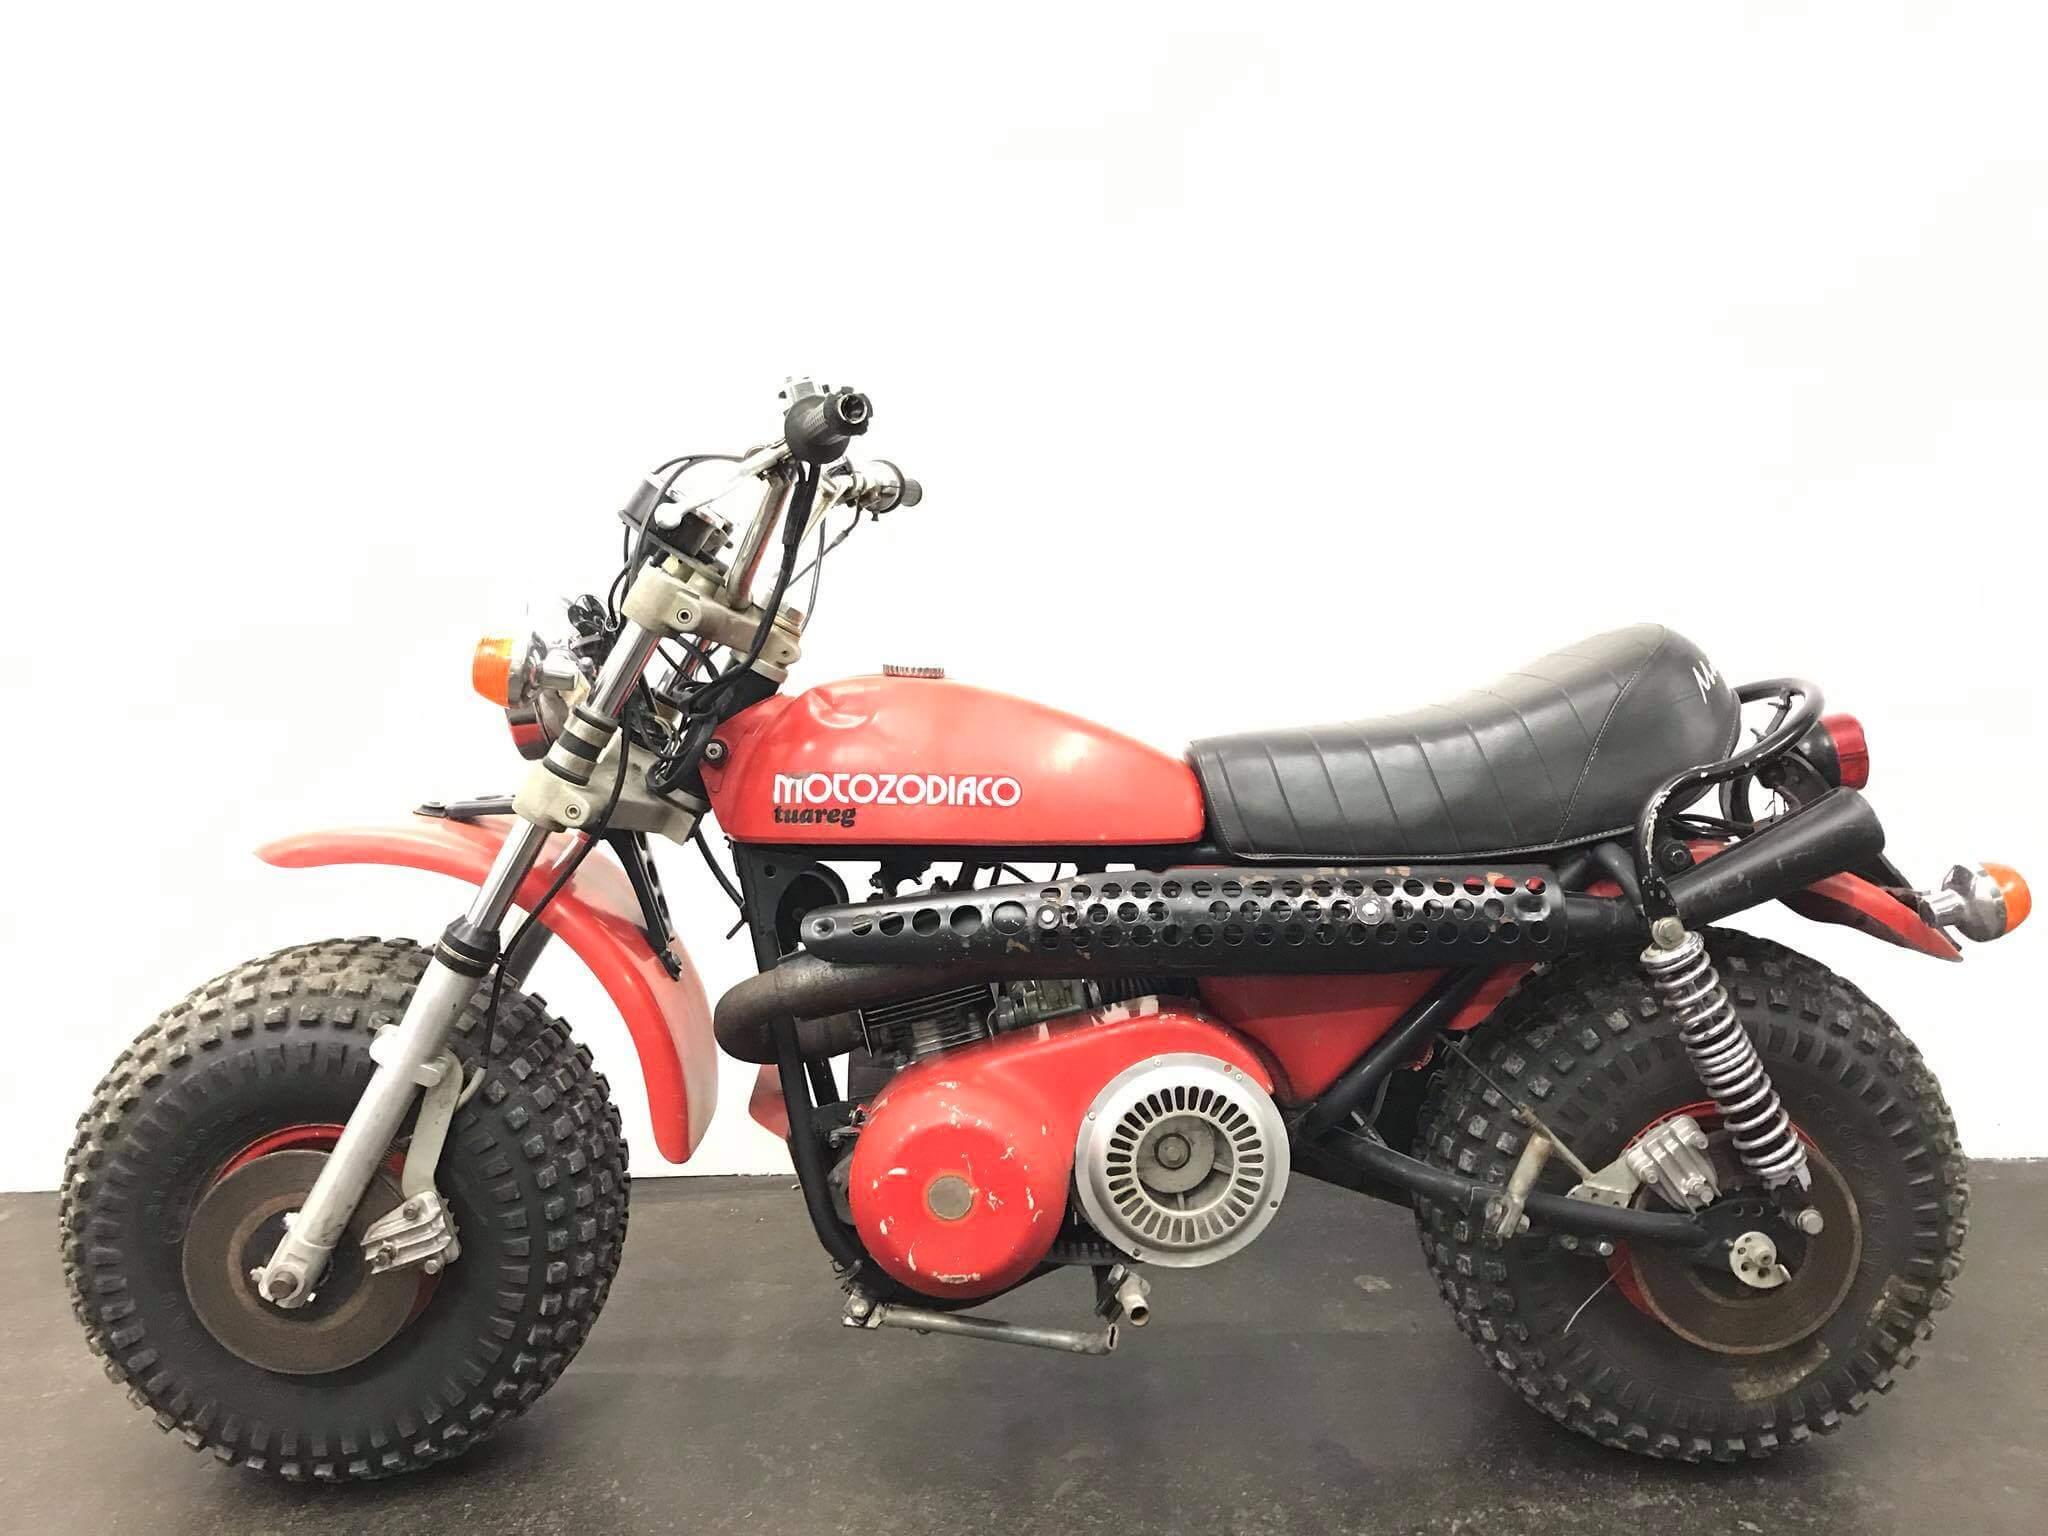 Moto Zodiaco Tuareg- Bud Spencer Motorrad - OK Team Classic